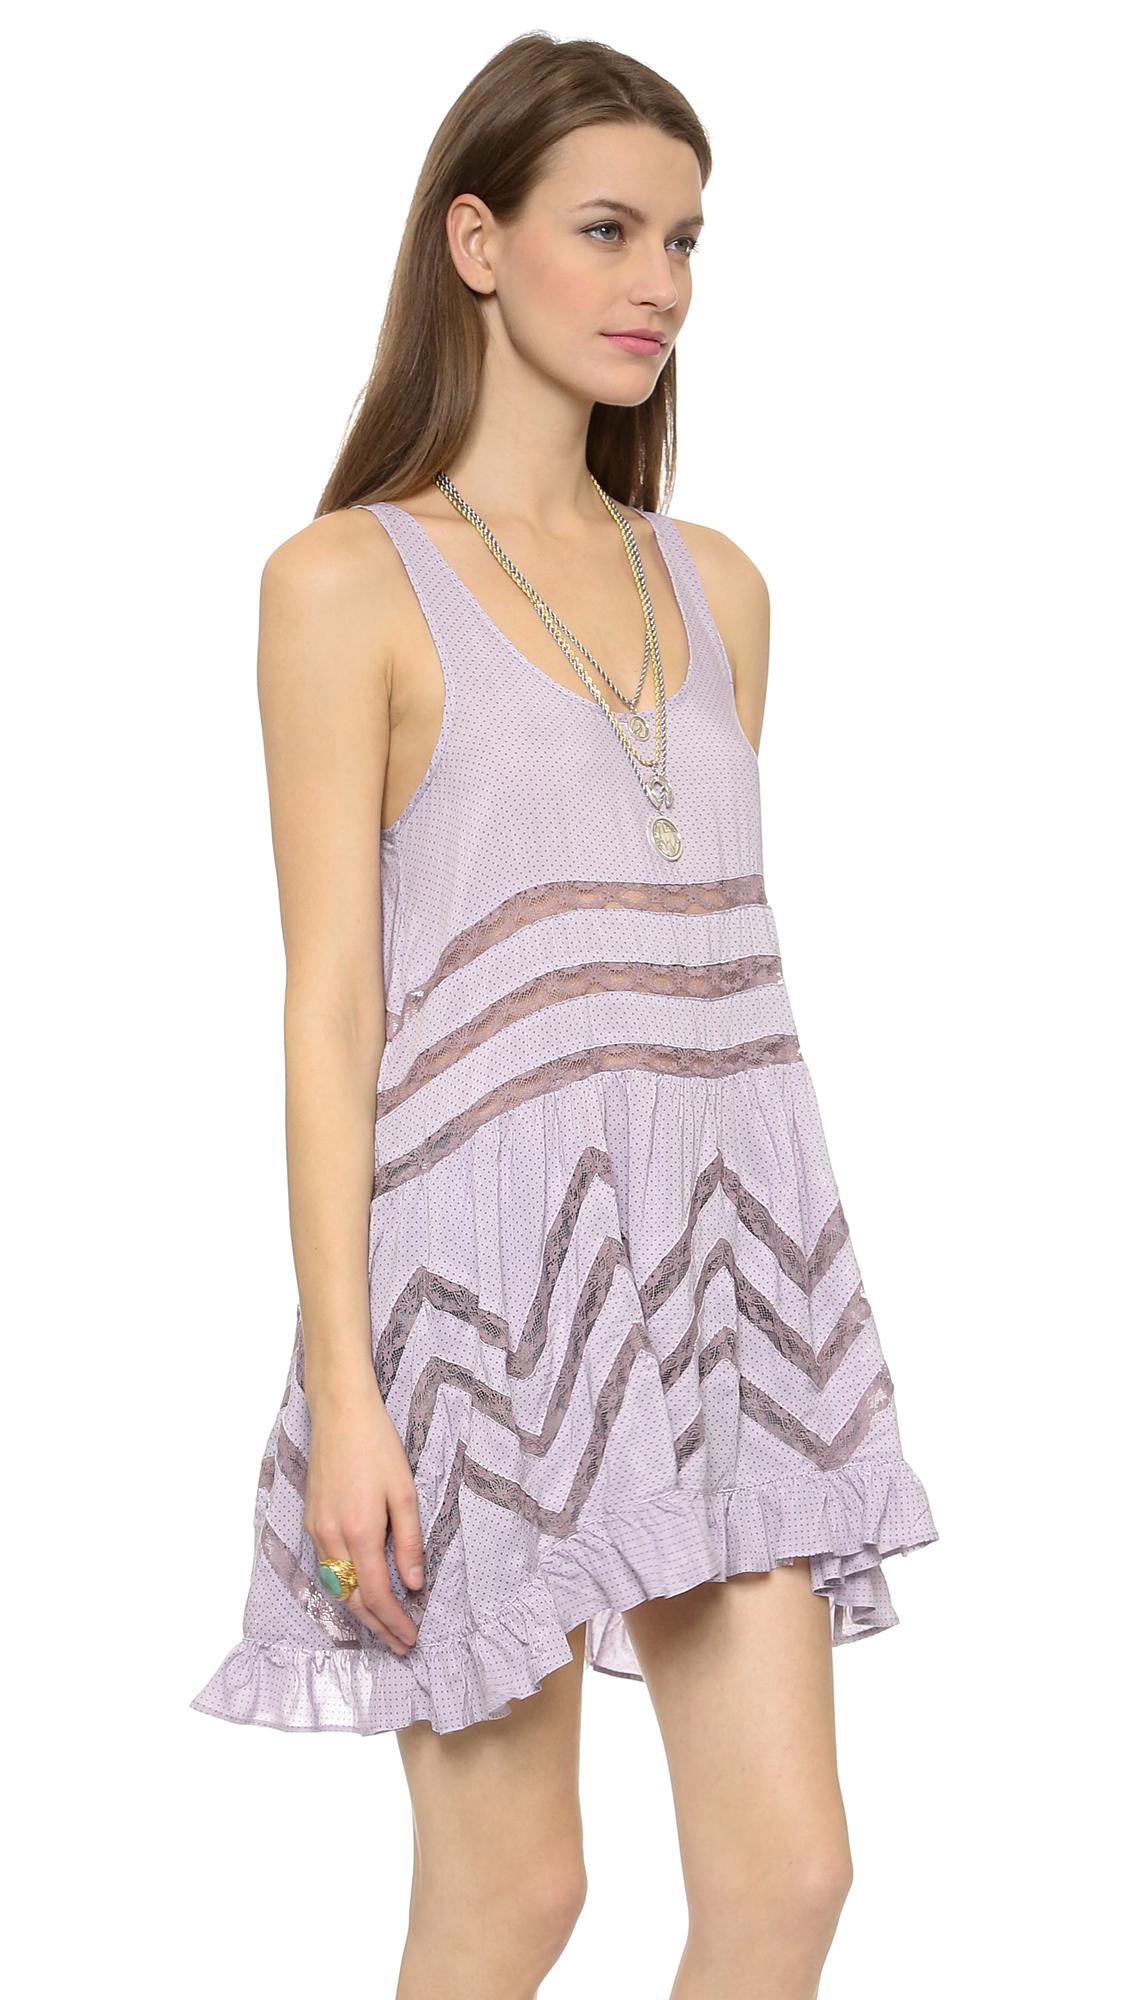 701981792ae0 Free People Tiny Dot Trapeze Mini Dress - Mango Combo in Purple - Lyst